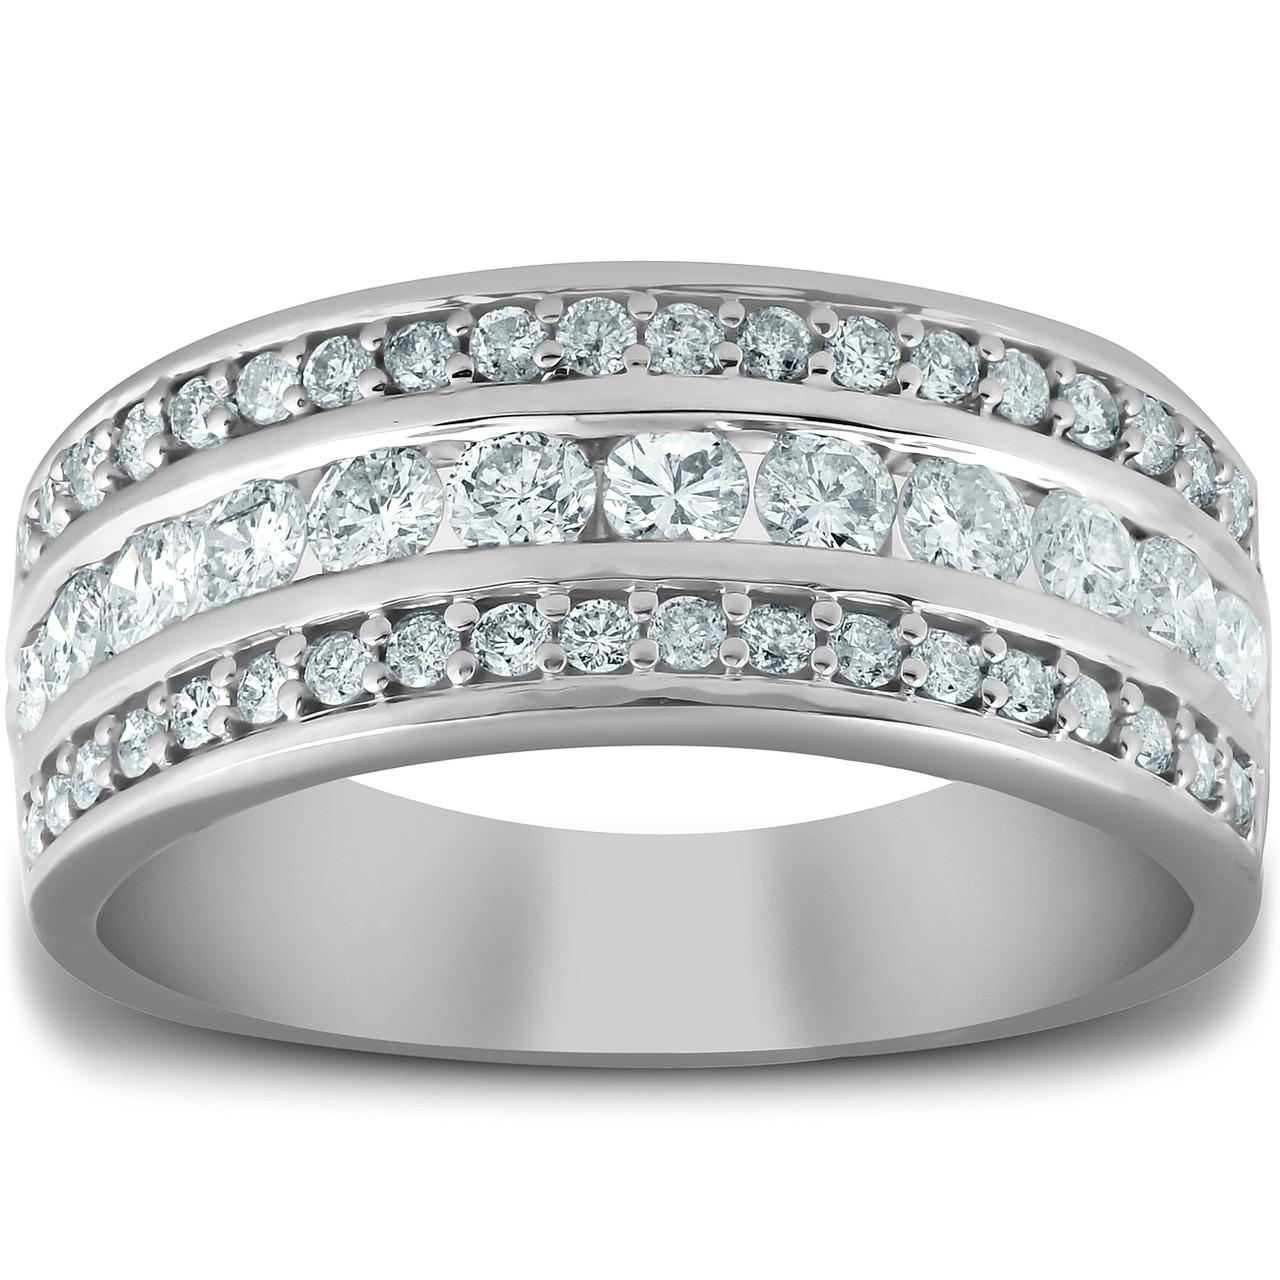 1//4 Carat Channel Set Diamond Ladies Anniversary Wedding Band in 10K Gold